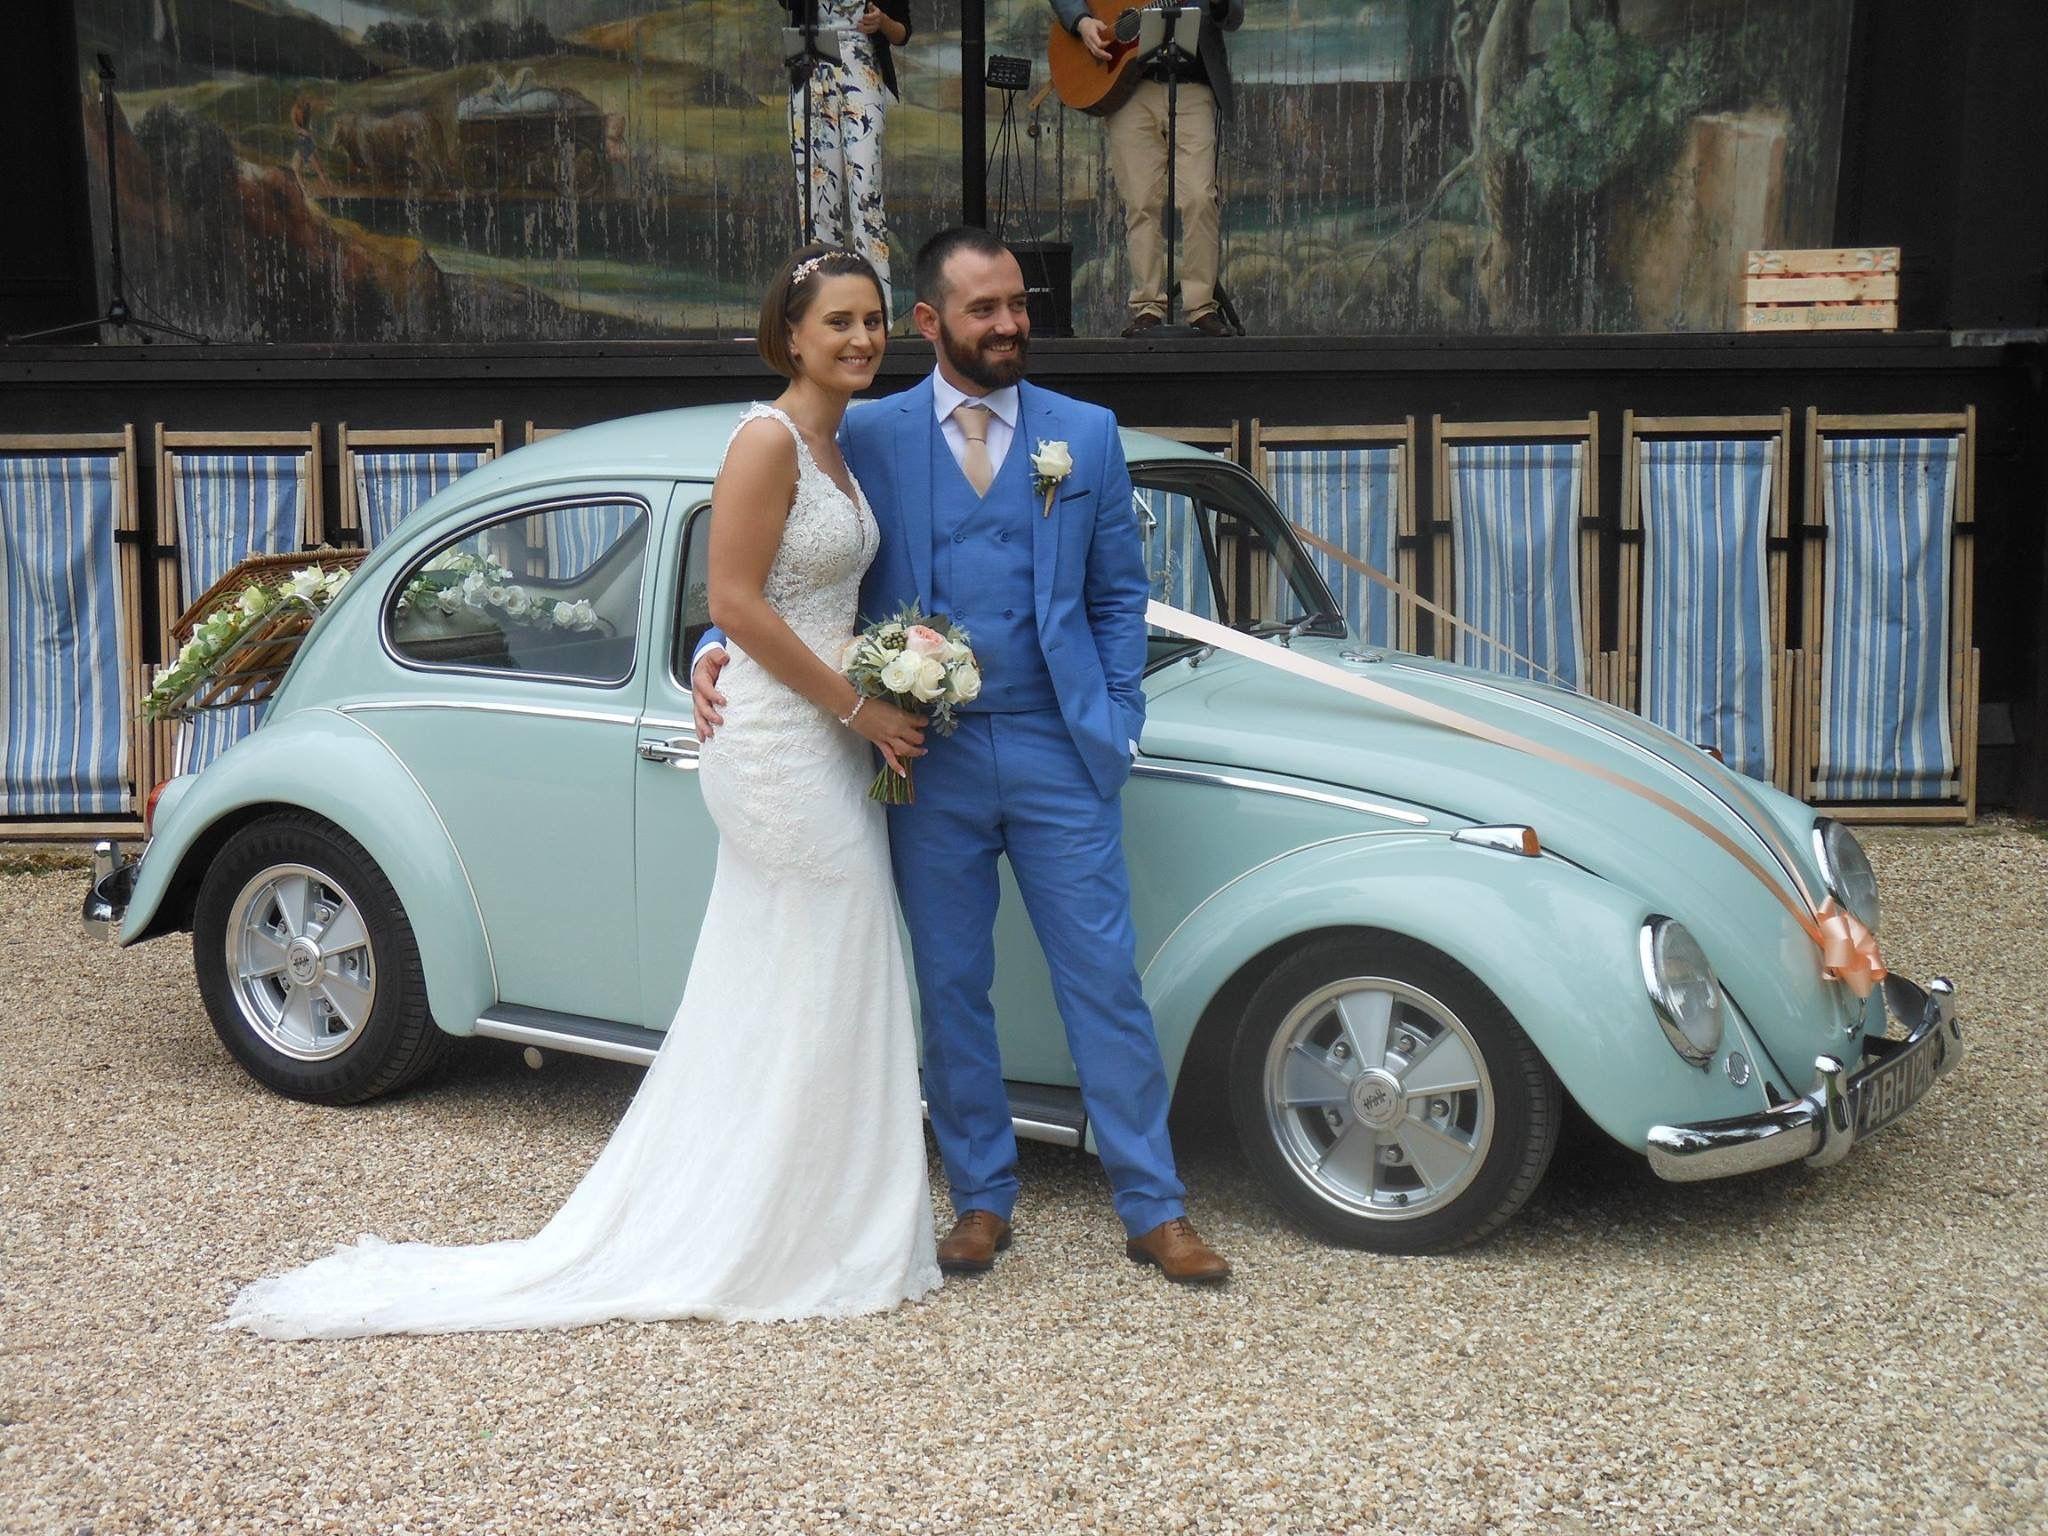 VW Beetle wedding car | Classic VW wedding transport | Pinterest ...